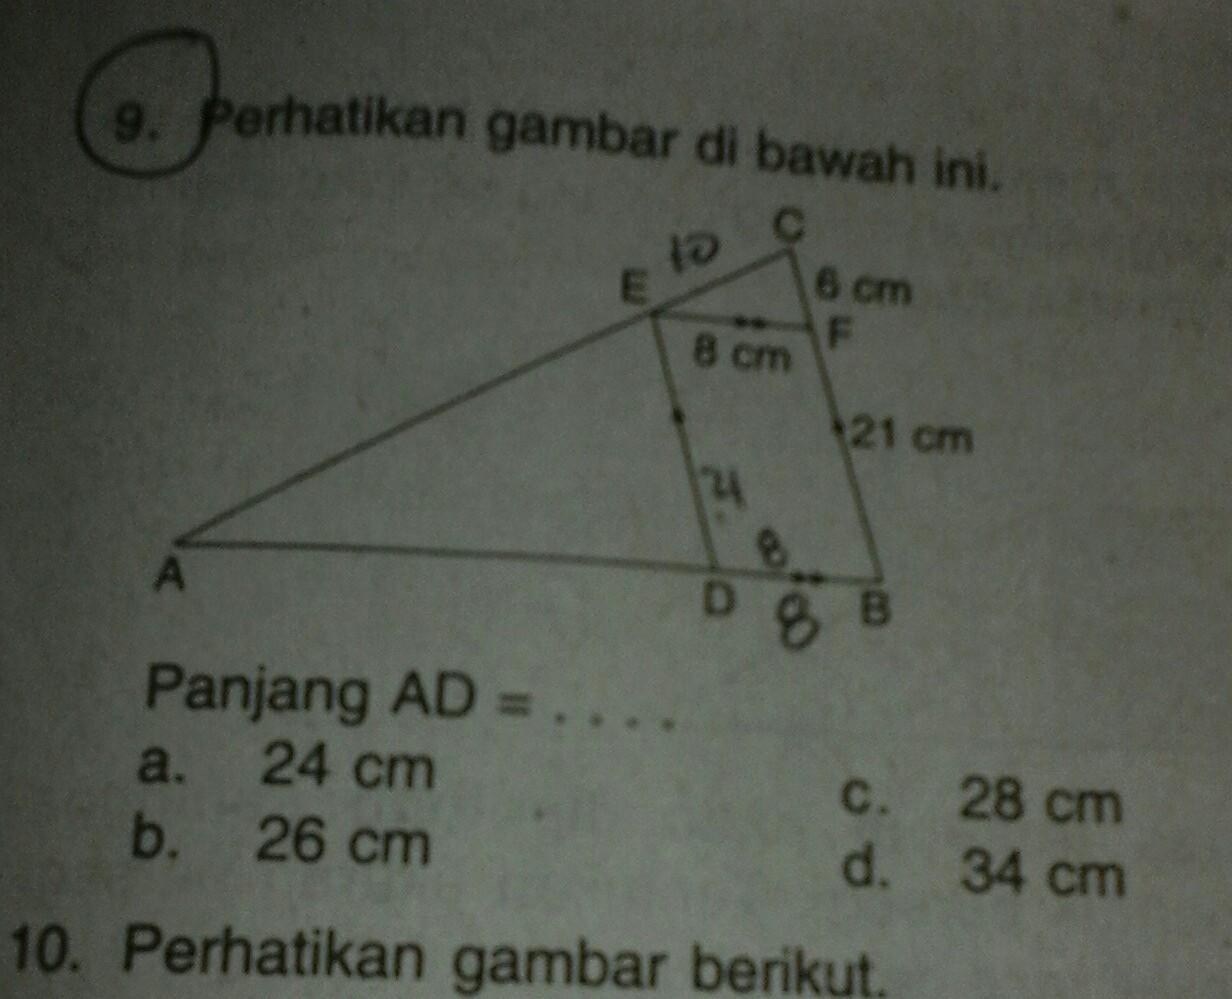 perhatikan gambar segitiga dibawah ini panjang AD ...